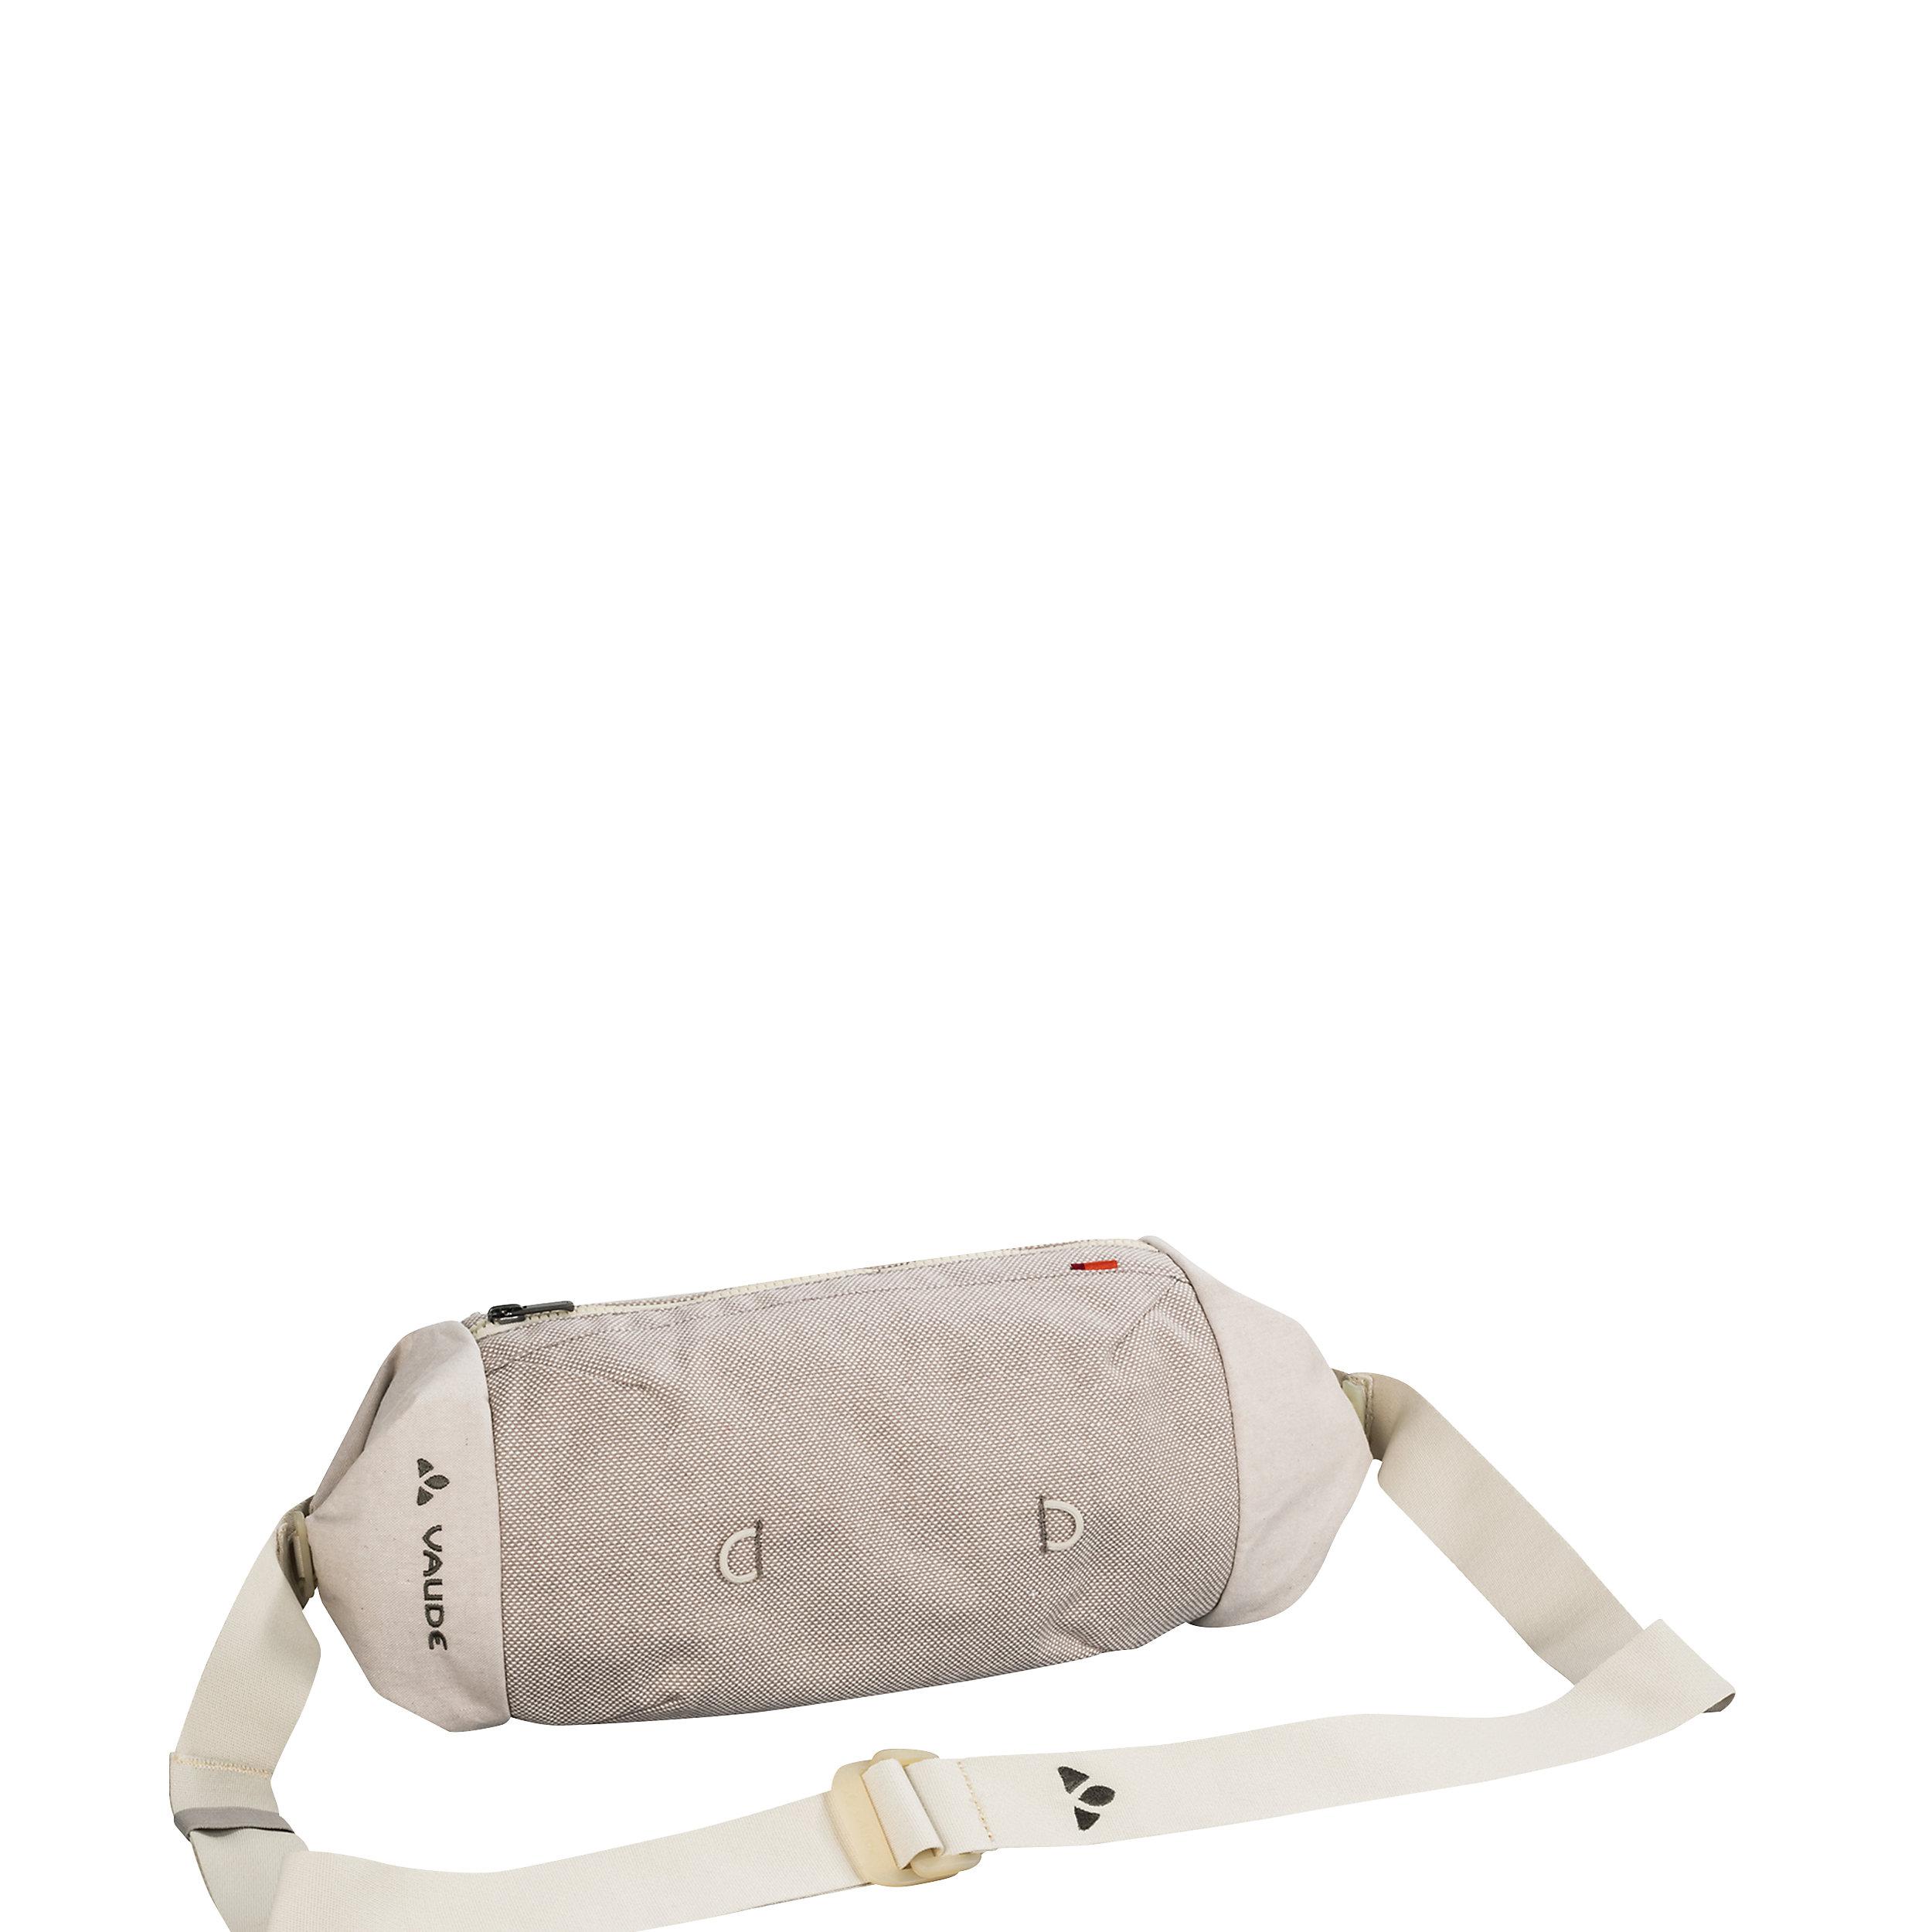 Bodybag Elm EXP Lignum 5 Liter